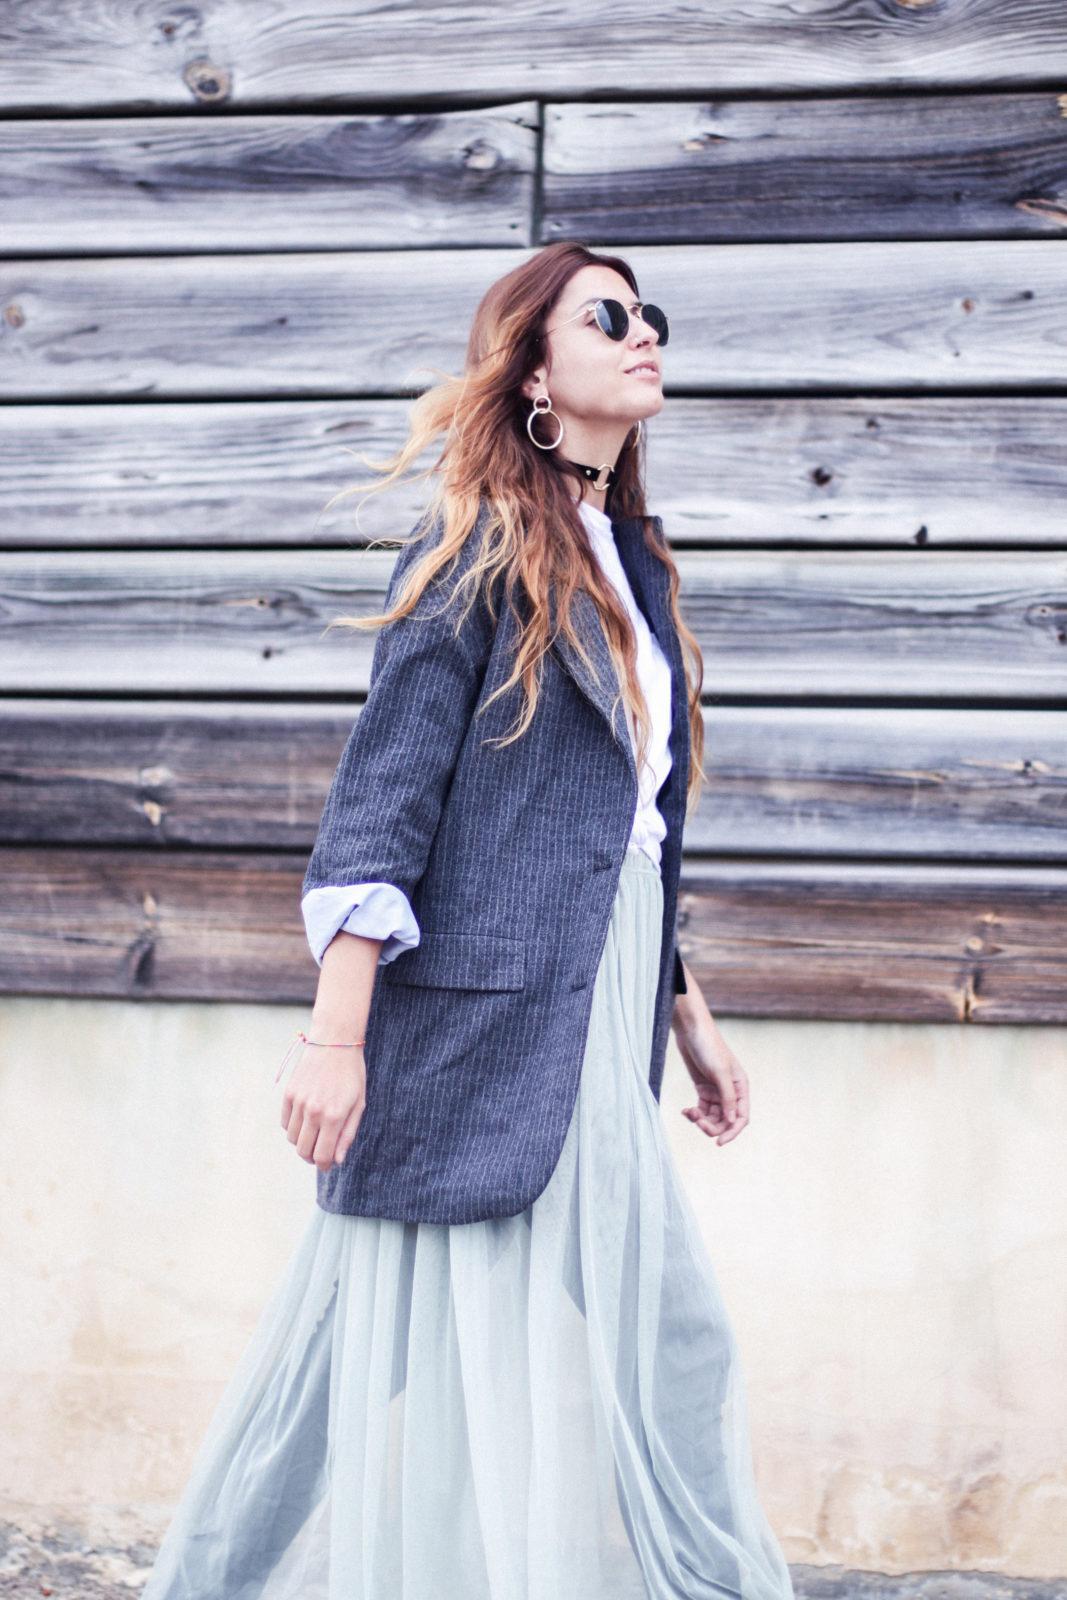 vestido_de_tul_sobre_pantalon_estilo_bailarina_blazer_oversize_pendientes_de_aros_choker_tendencias_trends_fall_2016_street_style_donkeycool-13